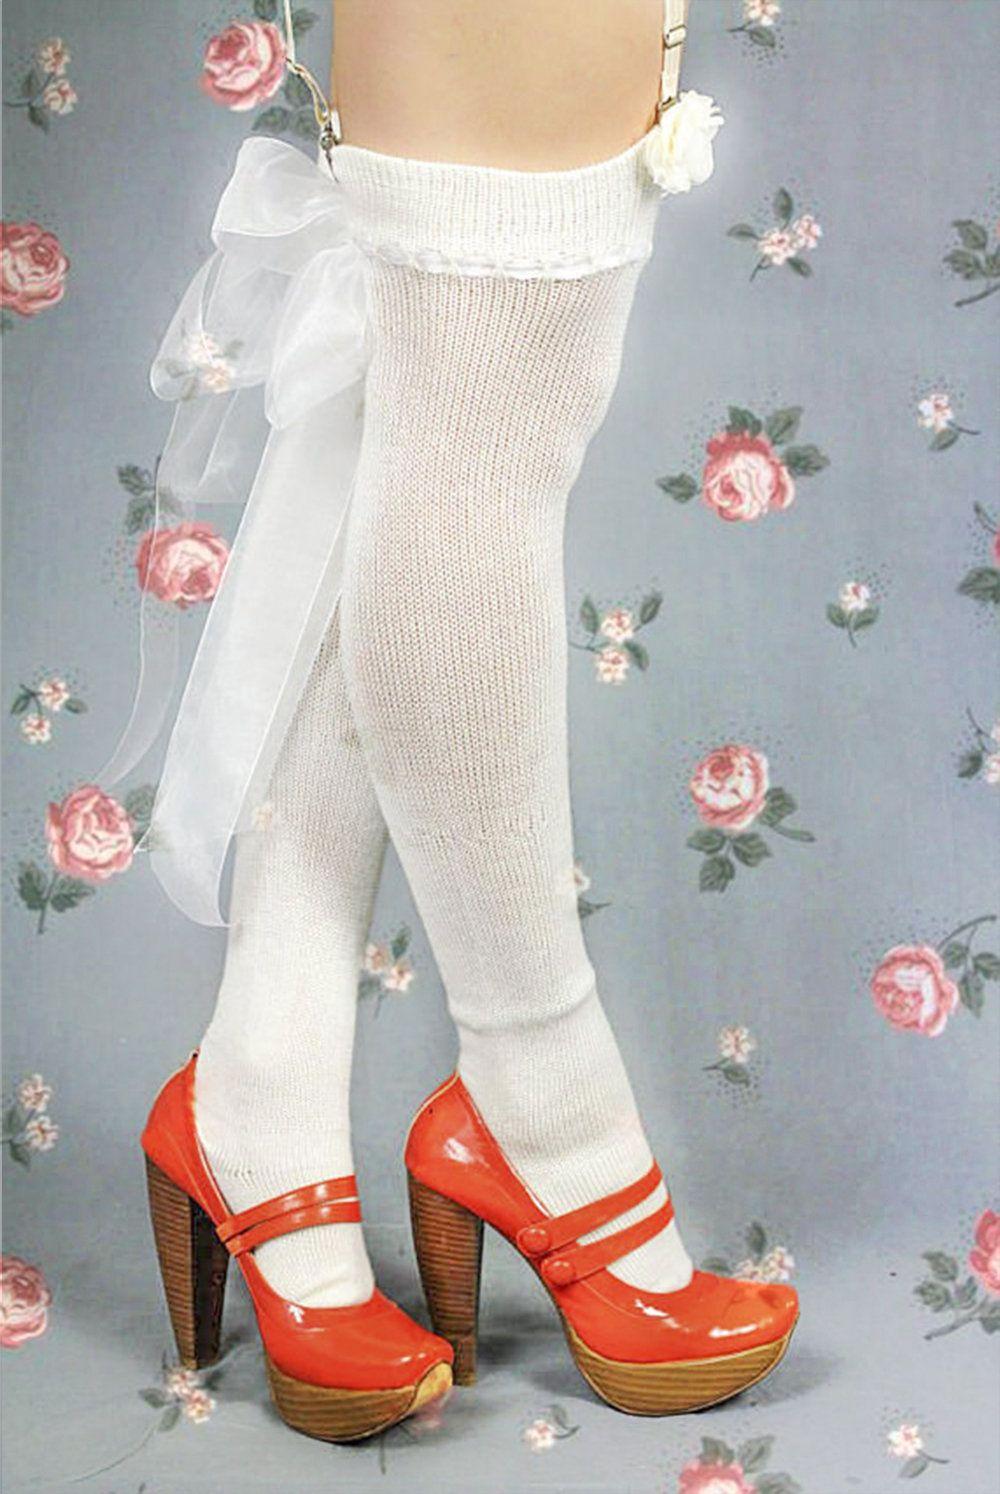 8b9dedda027 CASHMERE Silk Thigh High Stockings w sheer ribbon - Victorian Steampunk  Over the knee Socks - Burlesque Stockings for Boho Winter Wedding